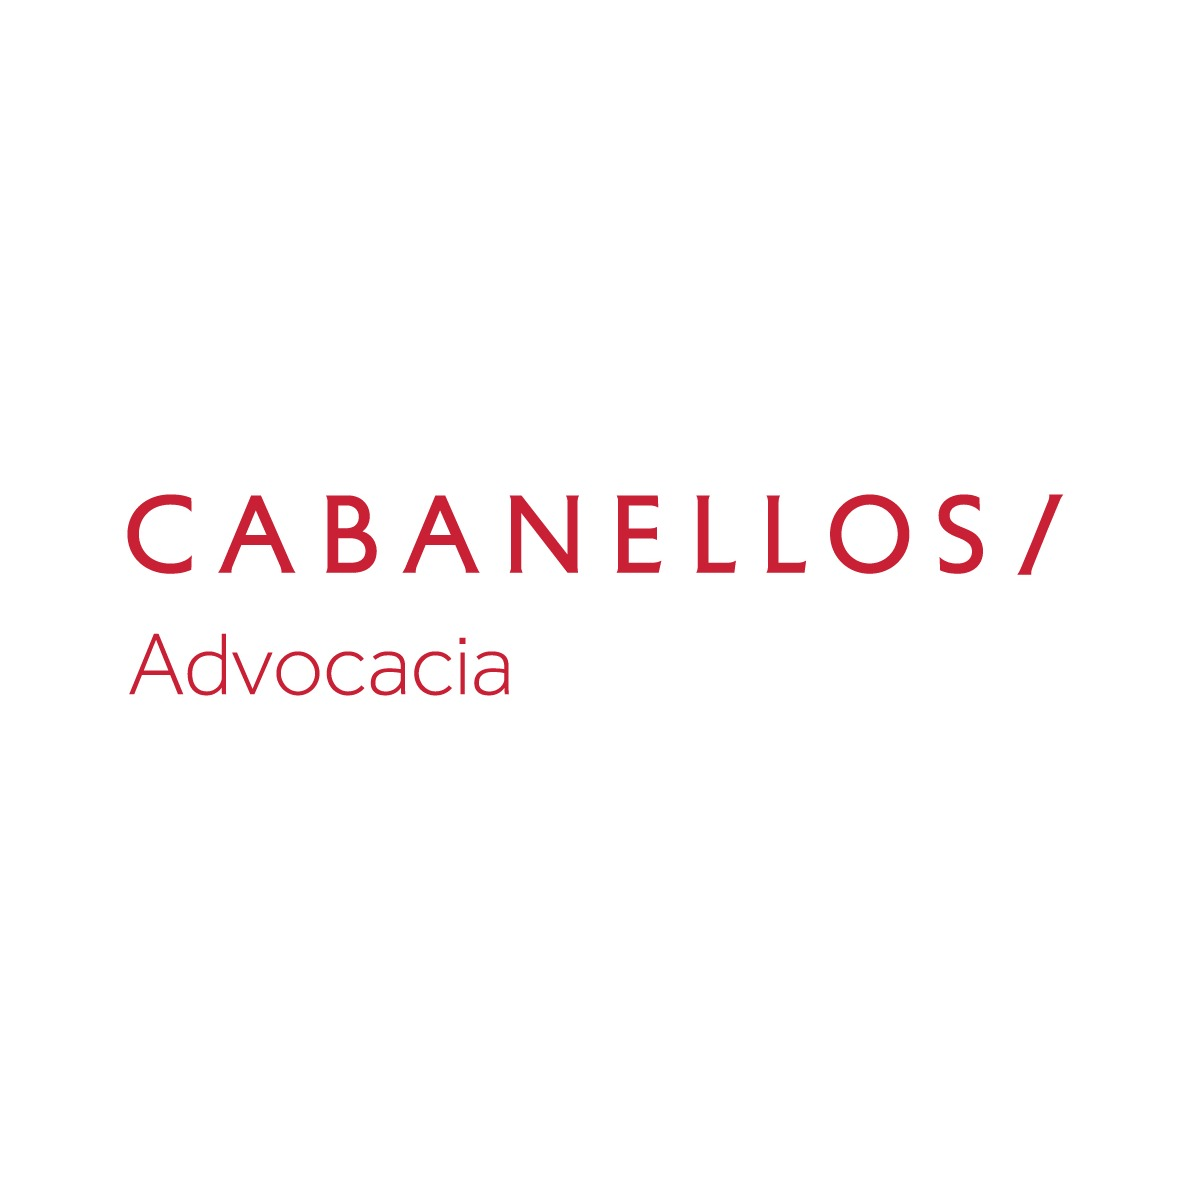 the Cabanellos Advocacia logo.